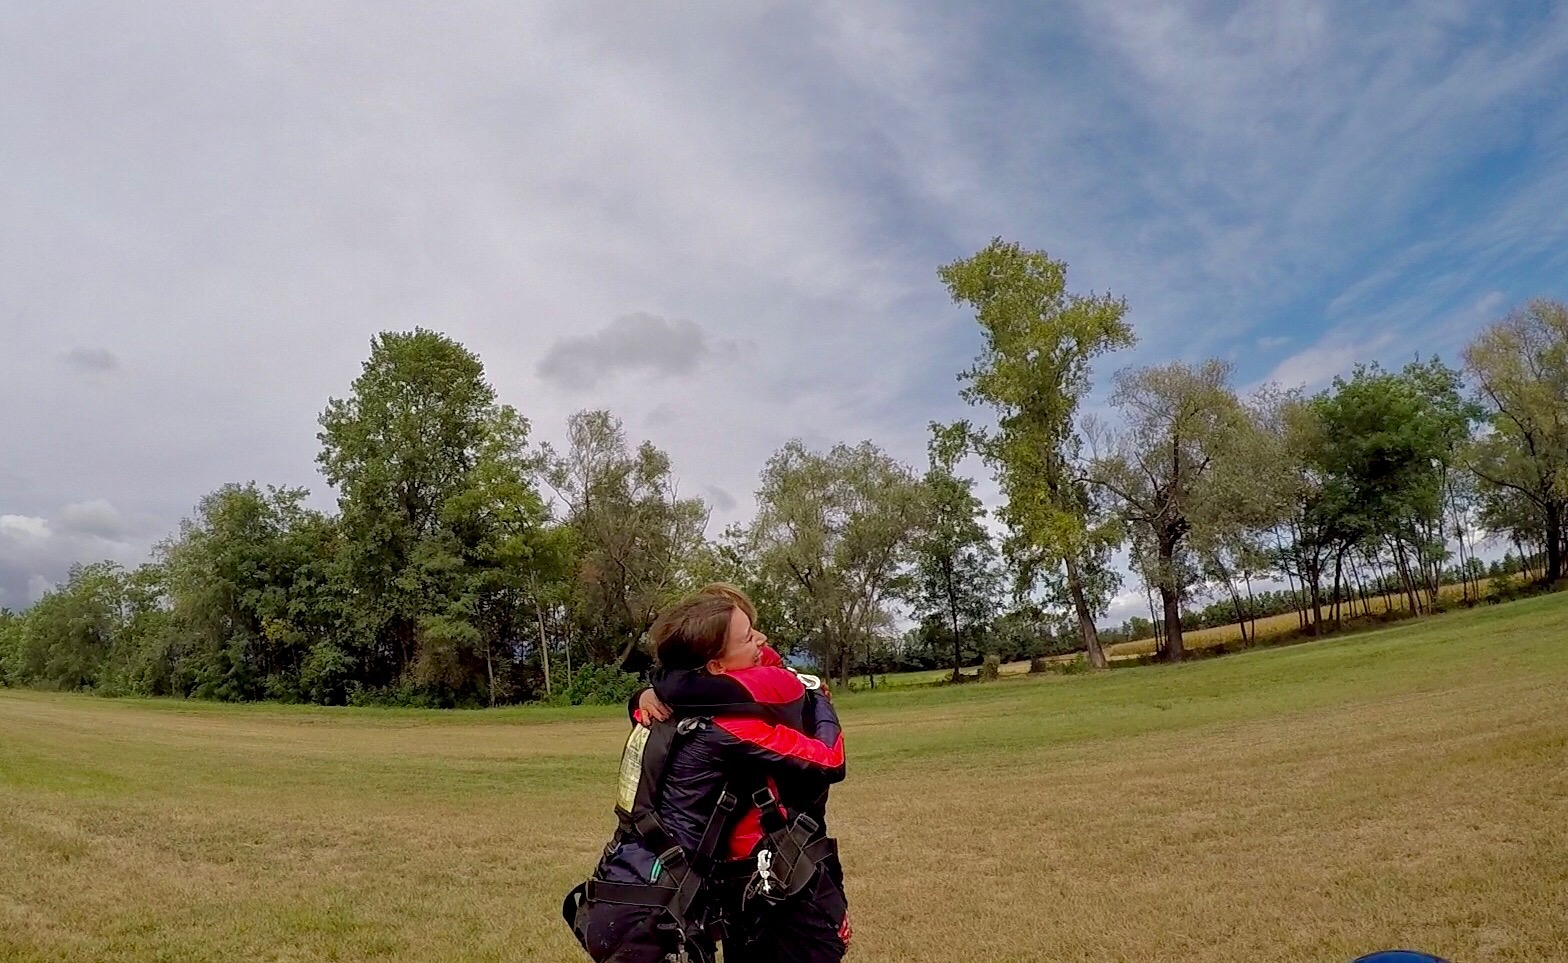 mum&daughter_skydiving_lustforthesublime